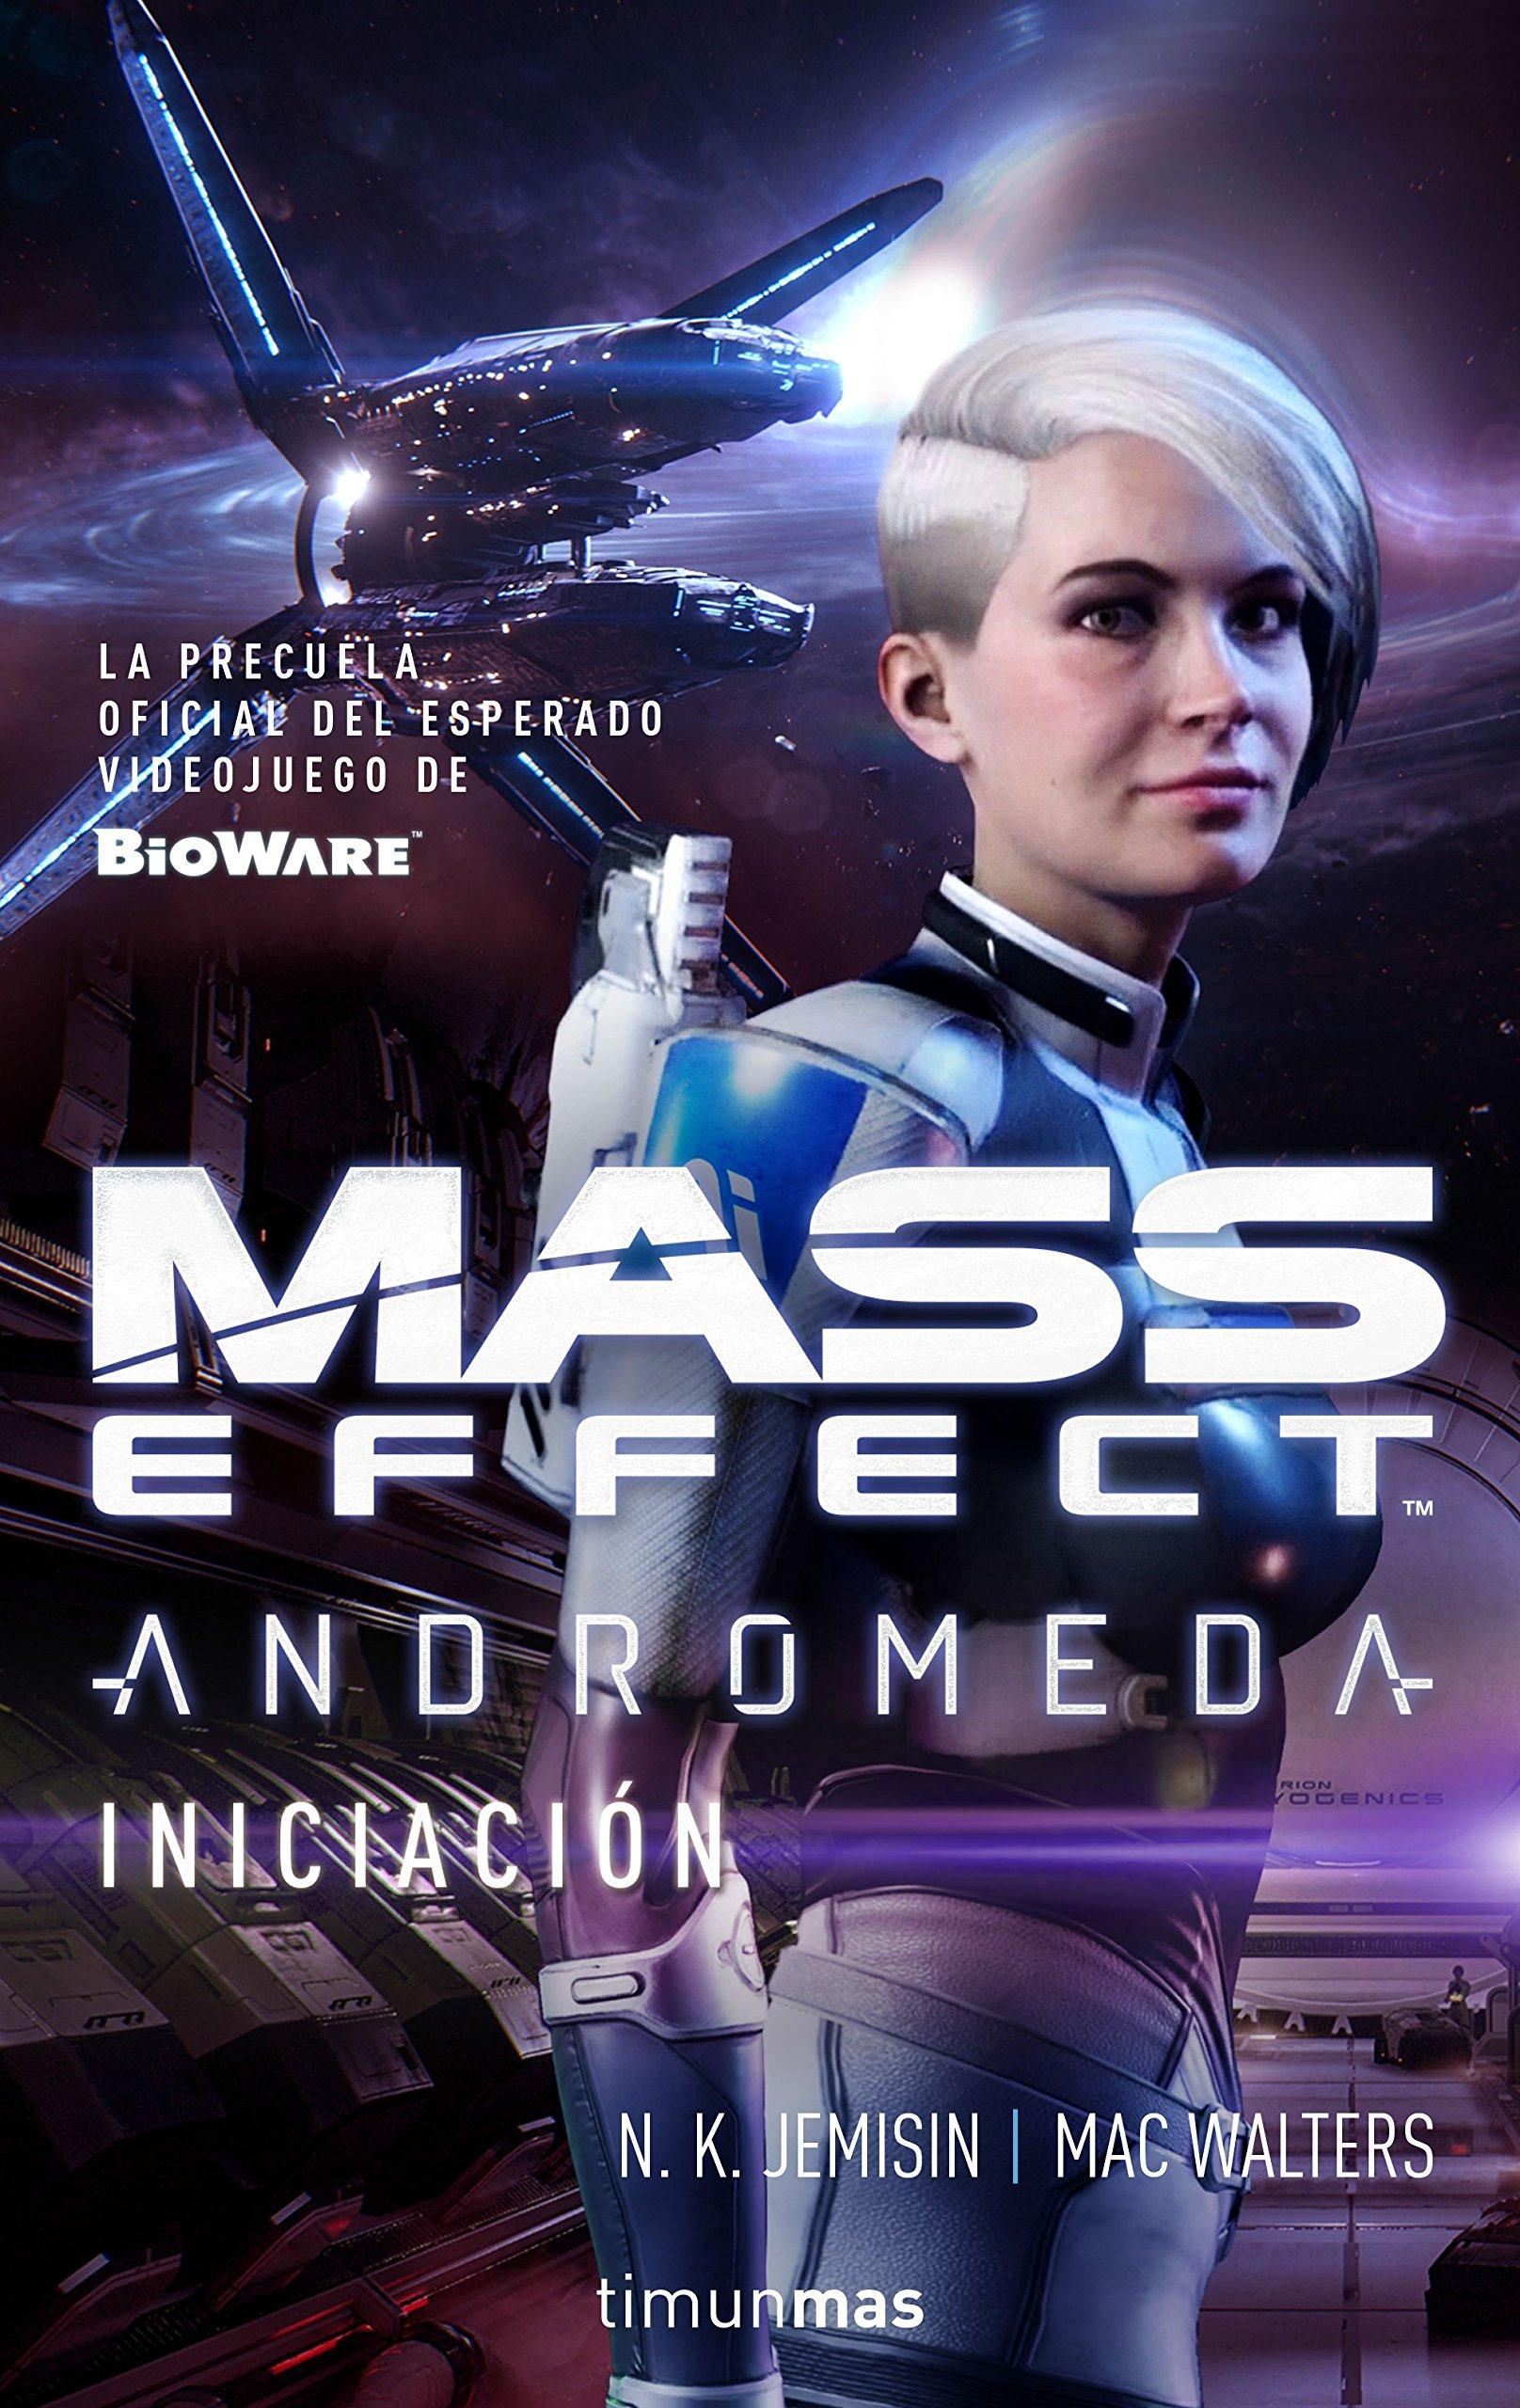 Mass Effect Andrómeda.Iniciación (Timunmas) Tapa blanda – 30 ene 2018 N. K. Jemisin Mac Walters Minotauro 8445005103